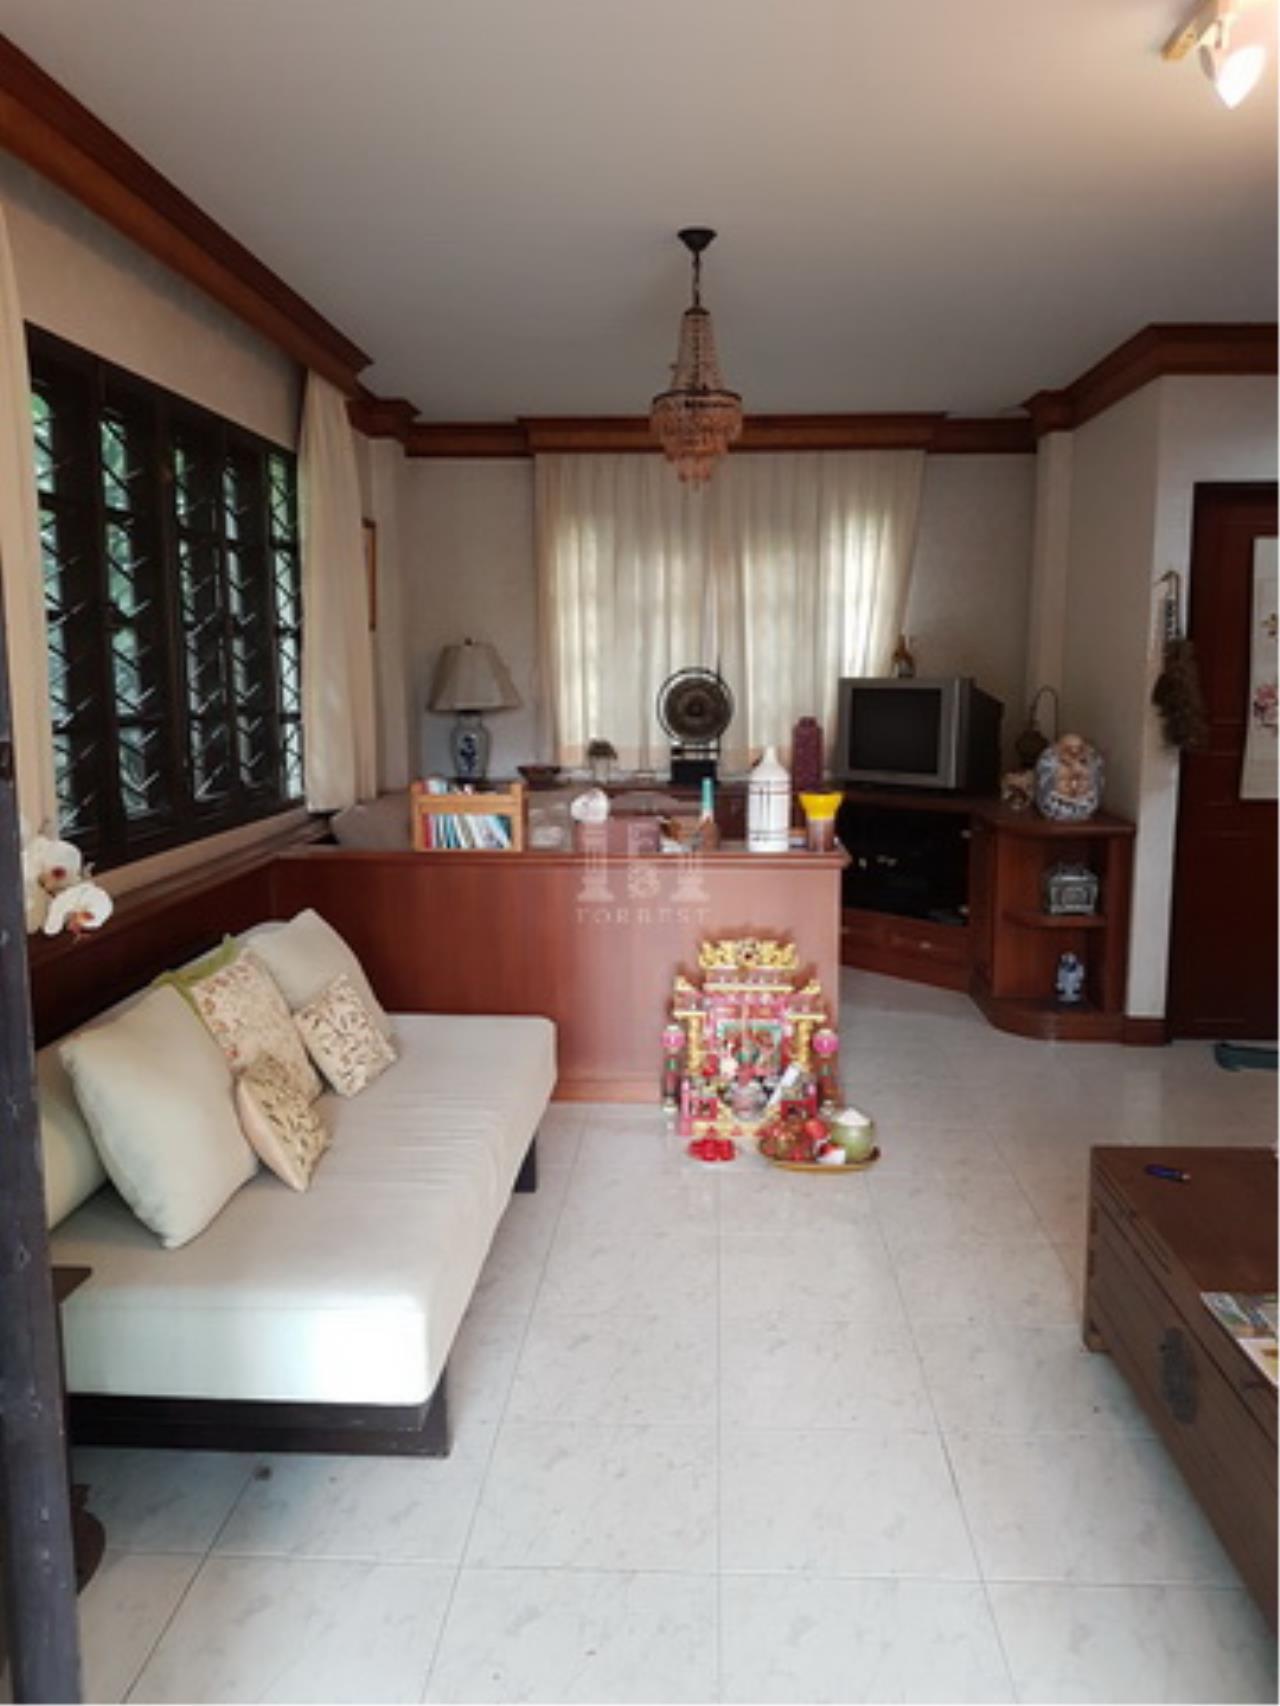 38395 - House For sale On Phet Kasem Road. 58 sq.w.